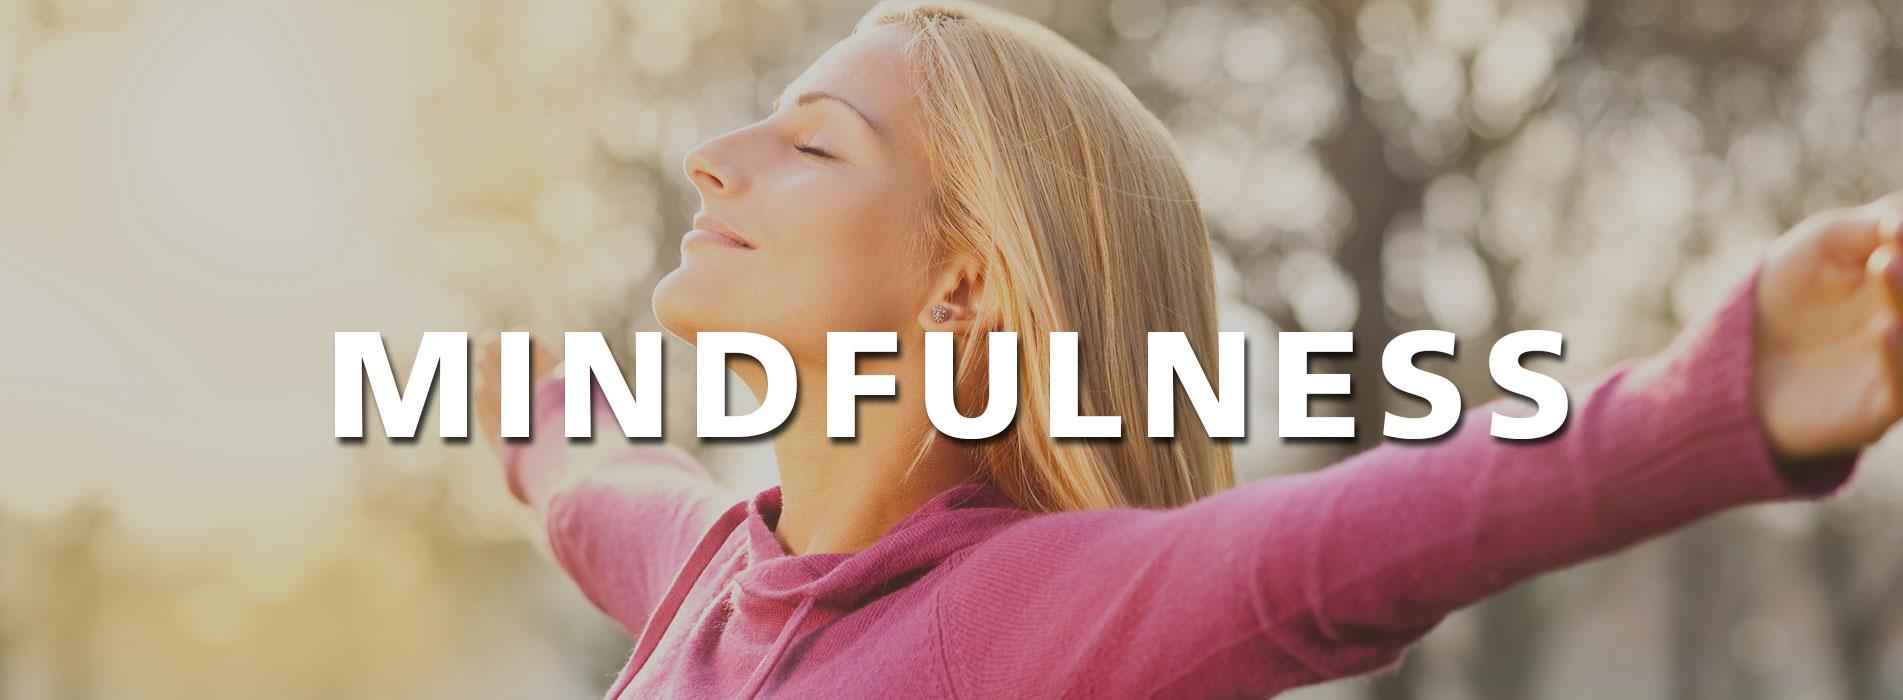 mindfulness-MOBILE2